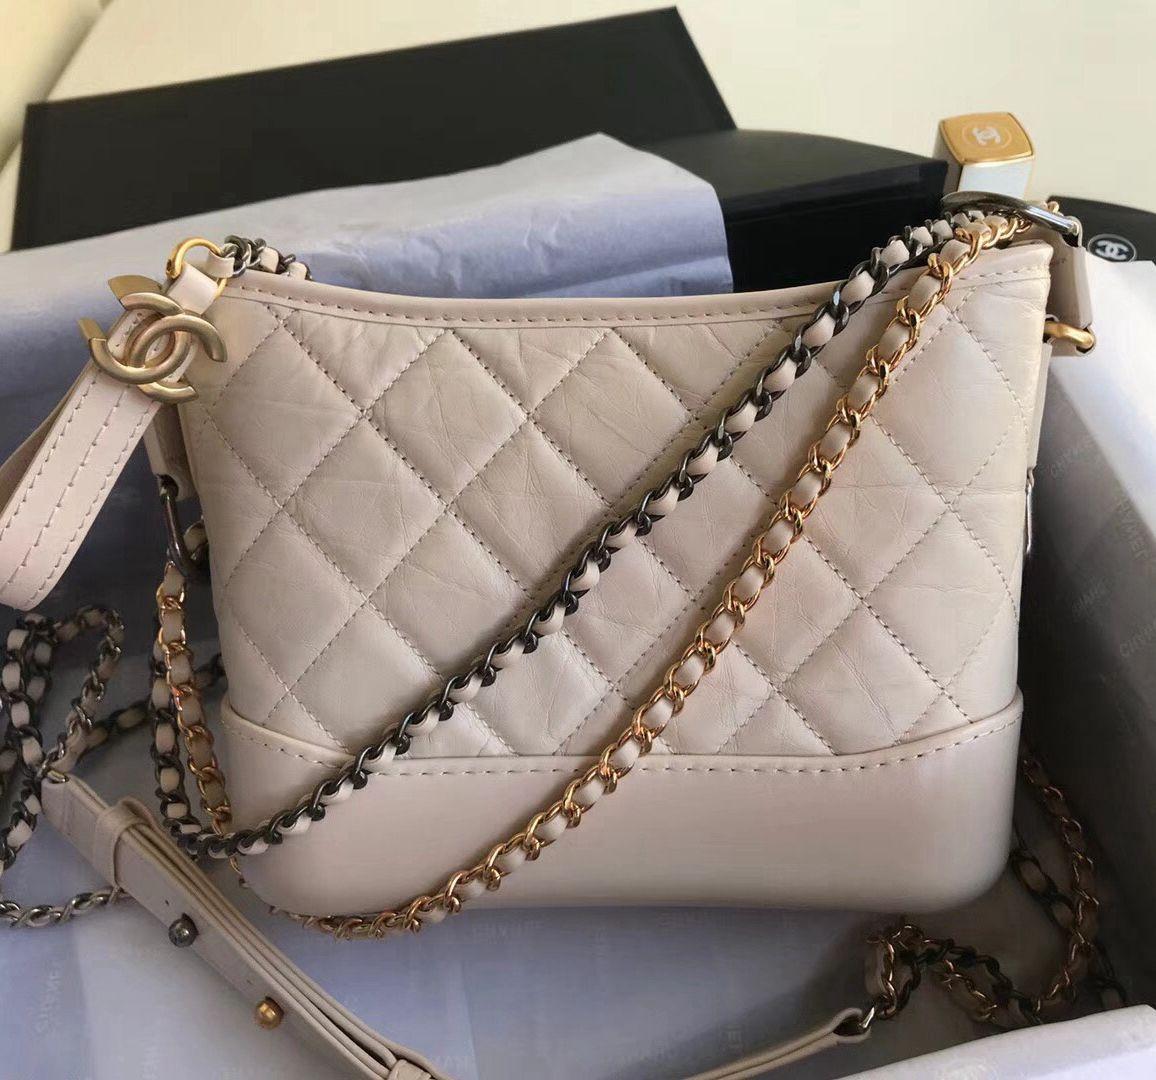 f0fb5a65a961 Chanel's Gabrielle Small Hobo Bag A91810 Nude 2018 | Chanel Handbags ...